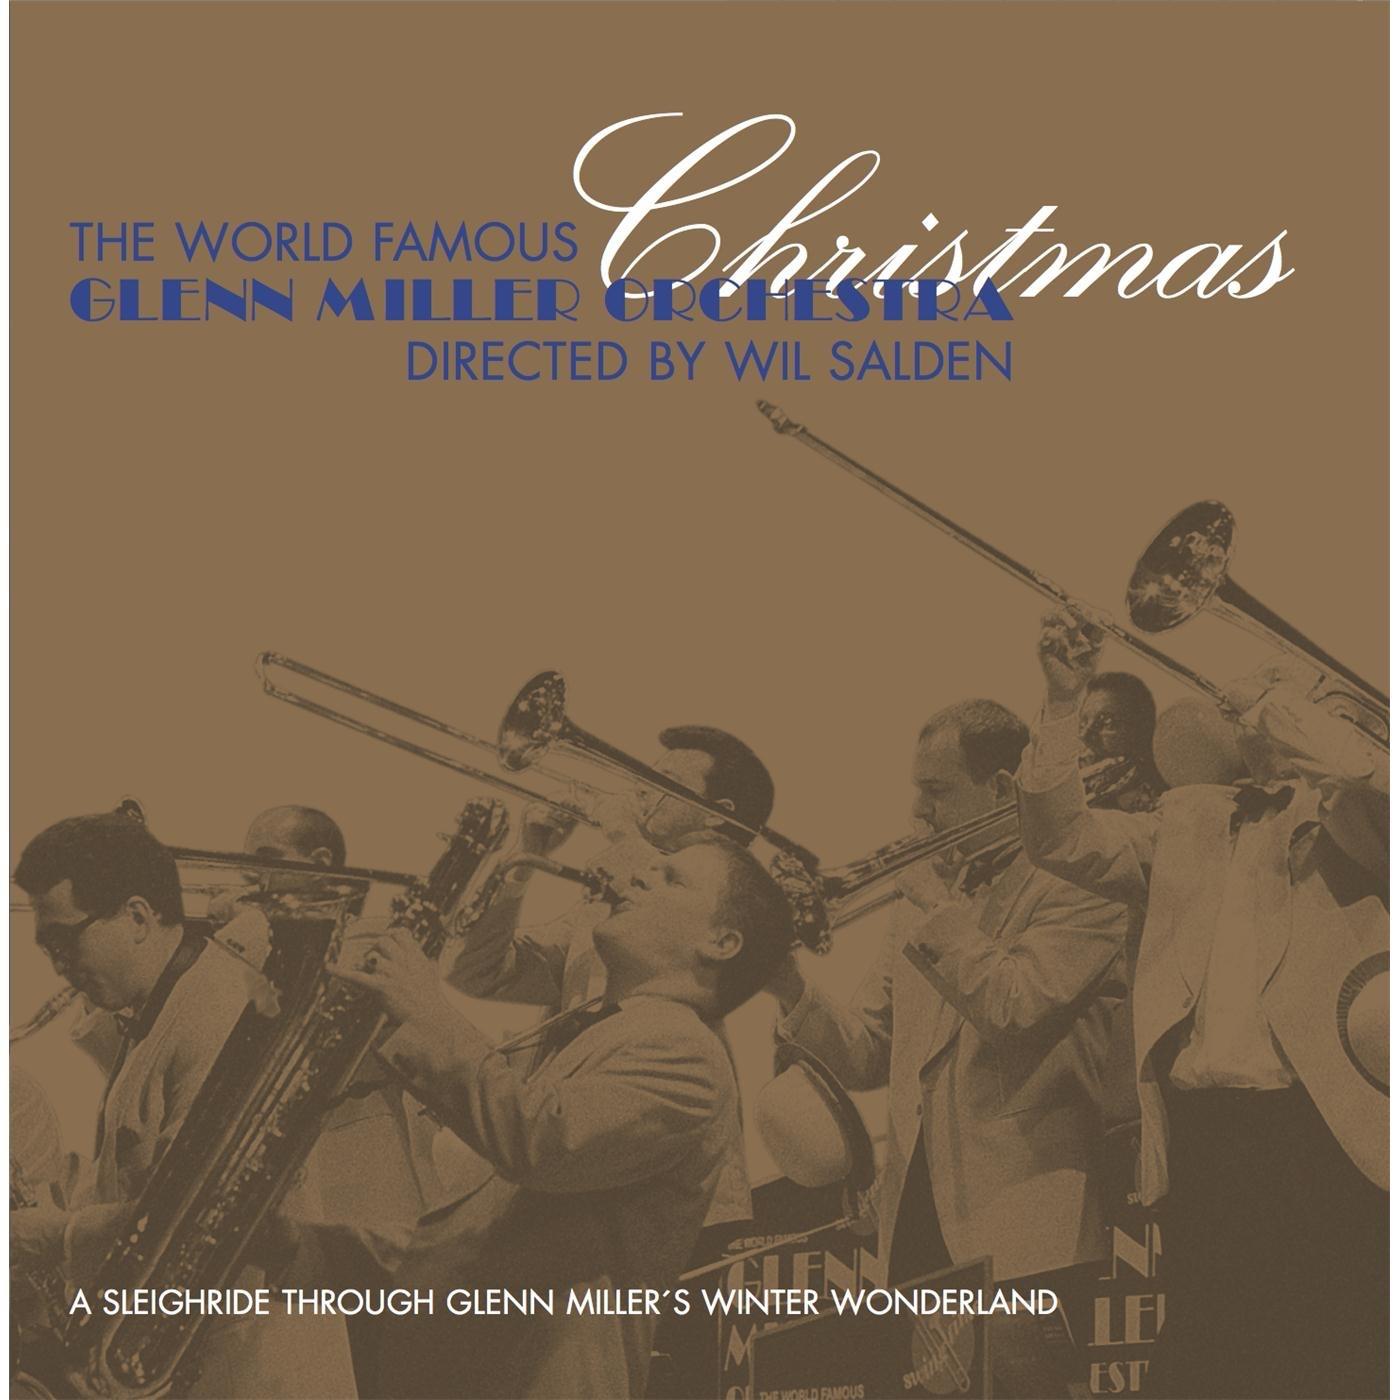 Christmas: A Sleighride Through Glenn Miller's Winter Wonderland